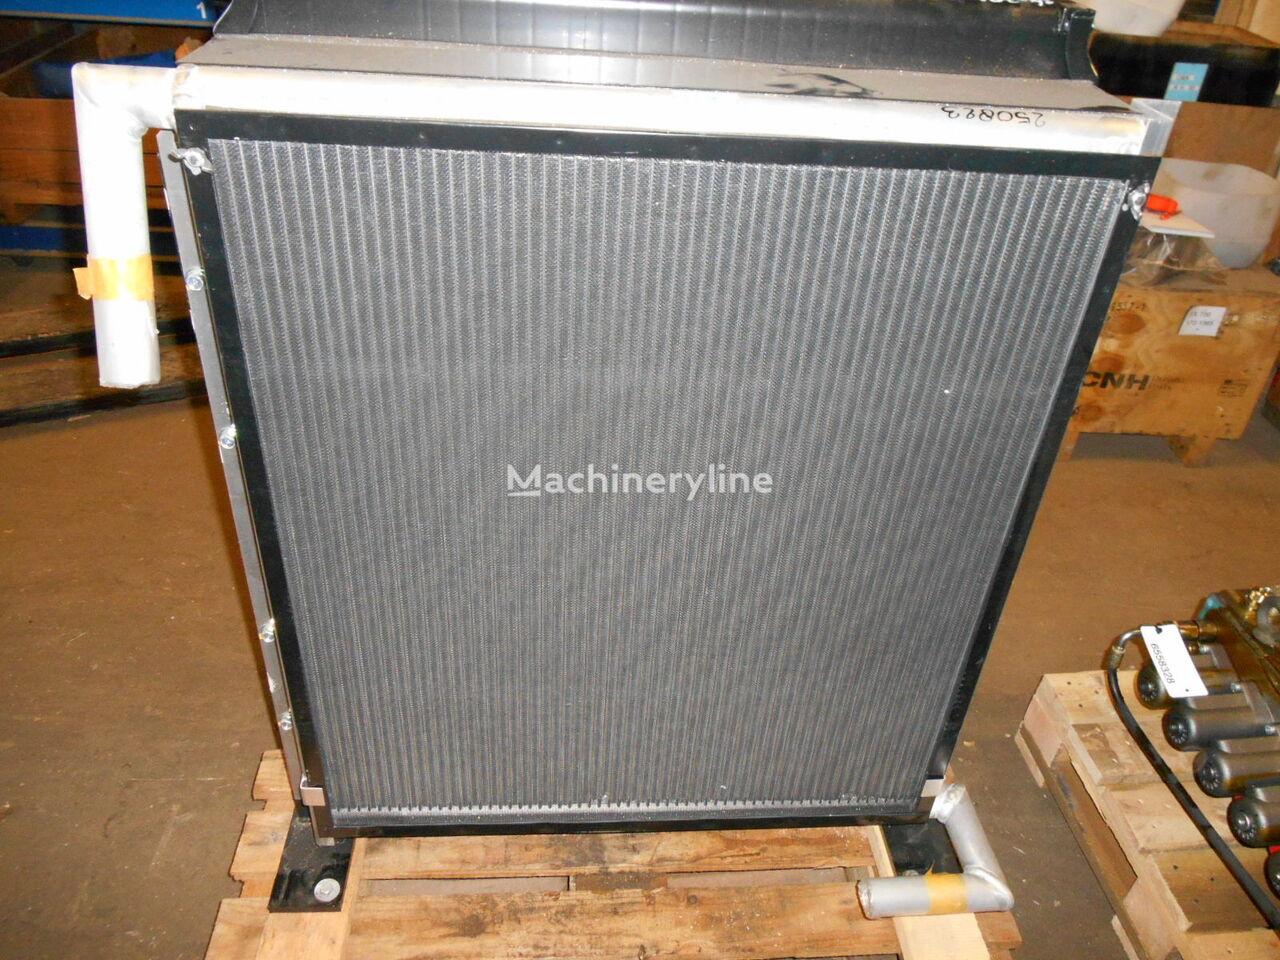 KOBELCO T.Rad 1452-054-1000-B engine cooling radiator for KOBELCO SK200-6 excavator